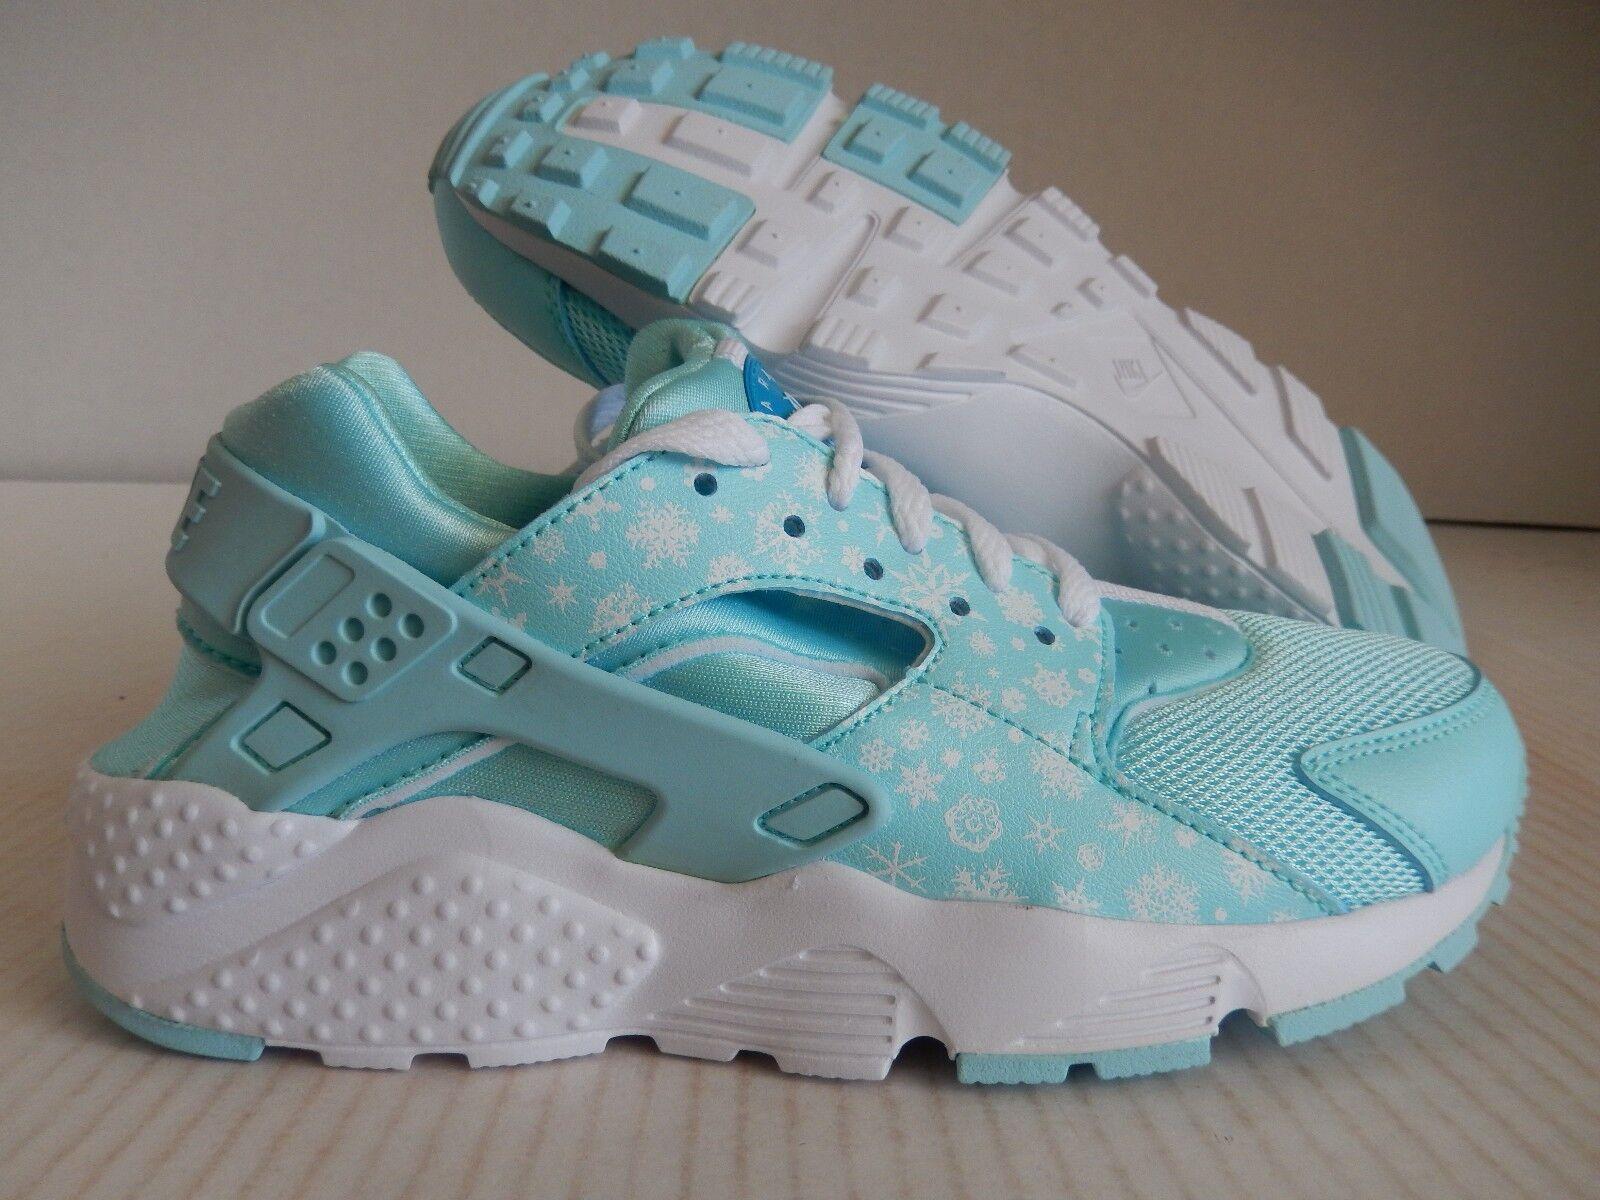 Nike Huarache Correr impresión (grade-school) Copa-Azul Lagoon tamaño [704946-401] 5Y-Para Mujer [704946-401] tamaño f50875